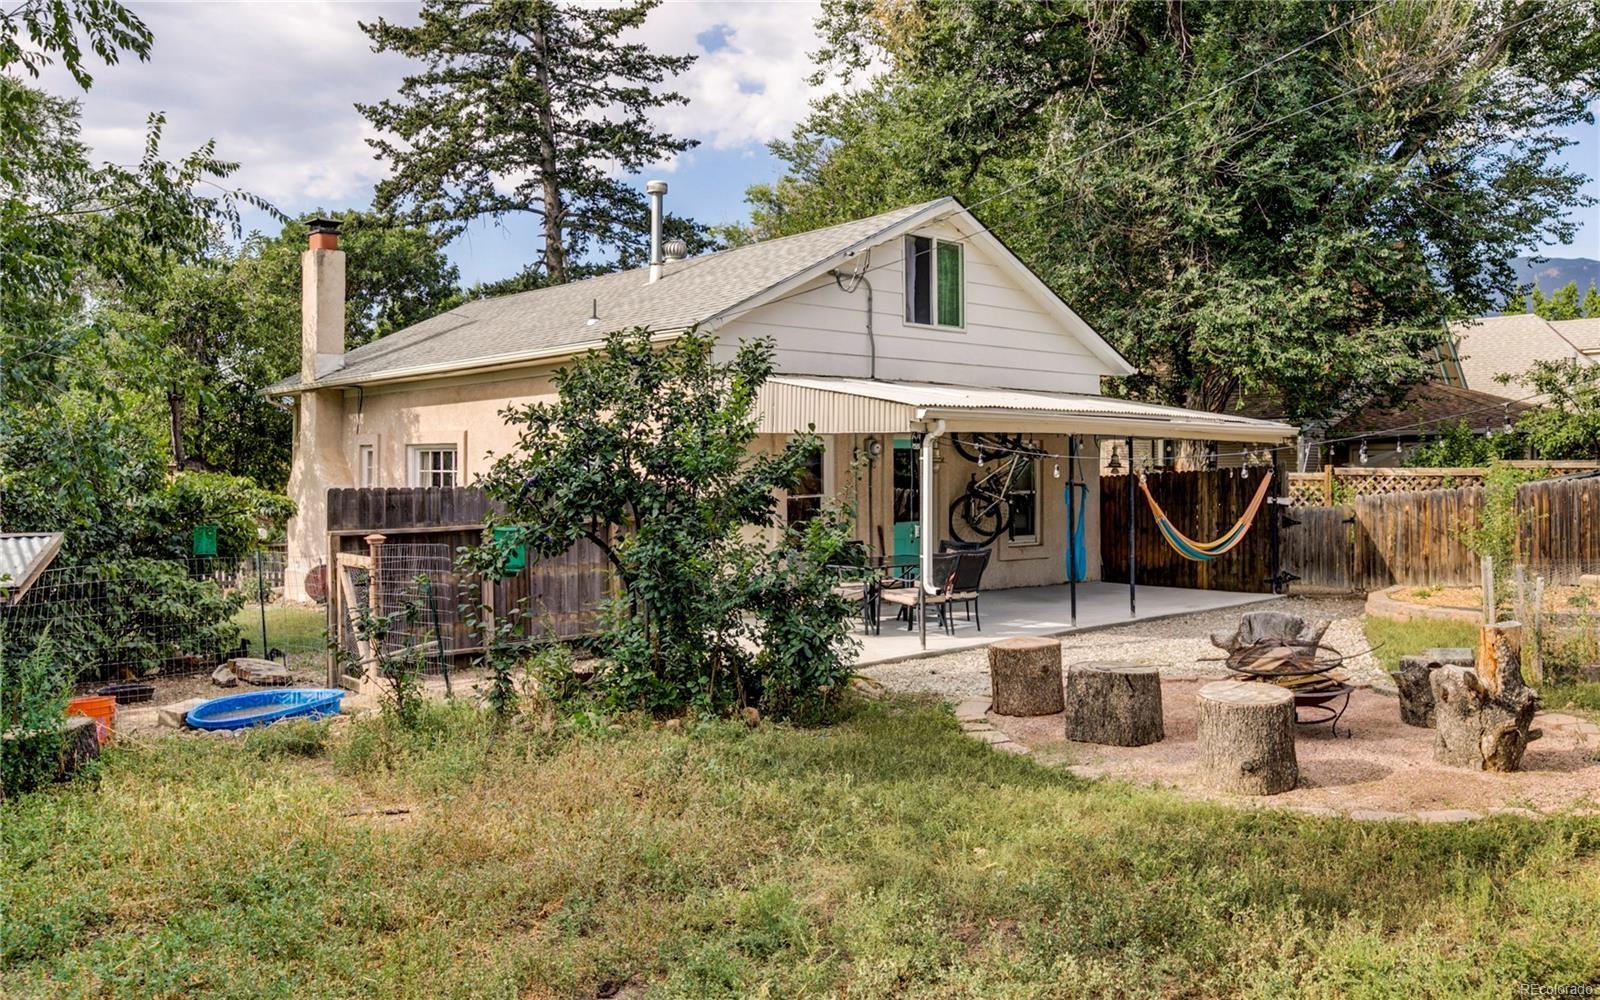 MLS# 3493456 - 30 - 2018 Armstrong Avenue, Colorado Springs, CO 80904